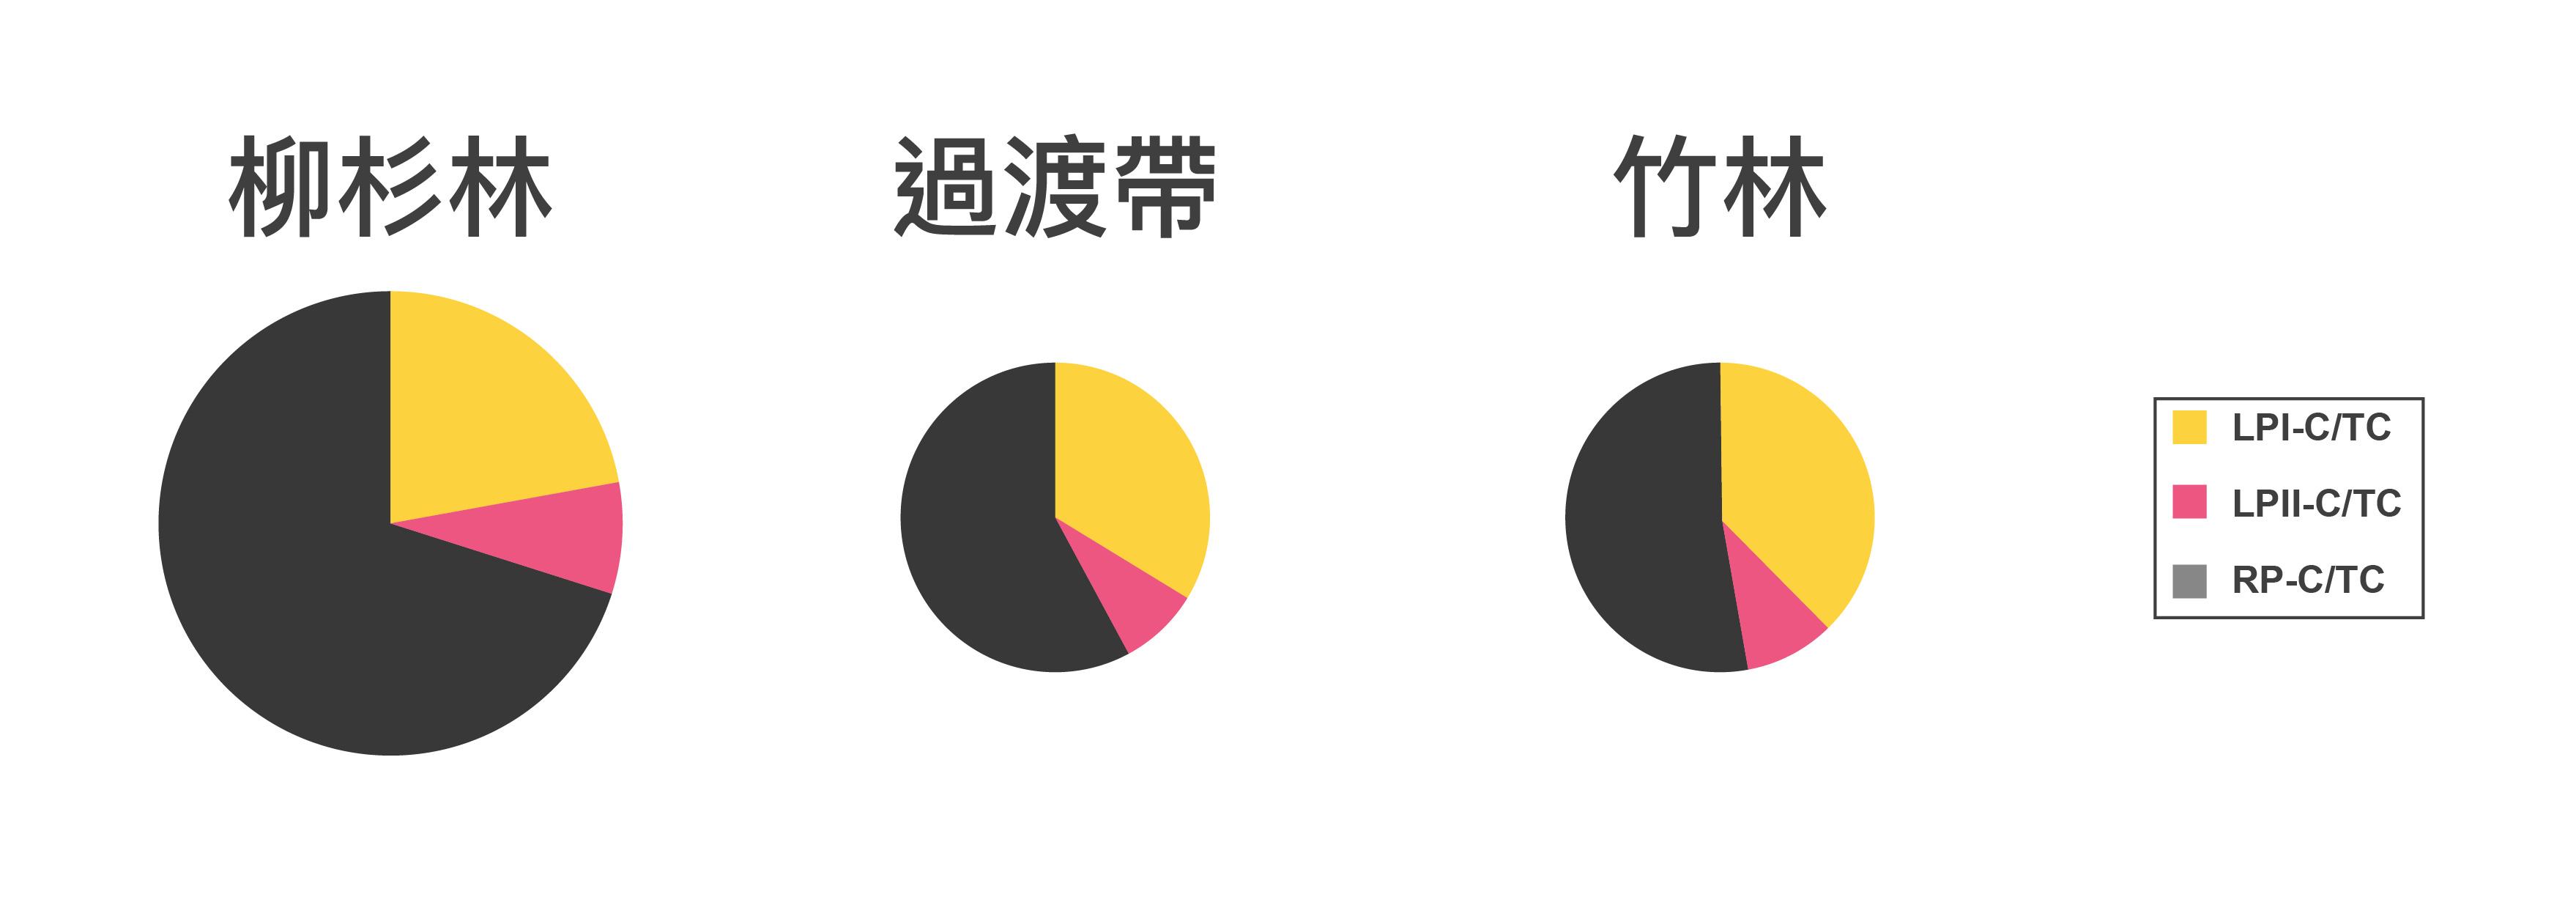 "孟宗竹林侵入鄰近的杉木林,導致土壤有機態碳含量(整個圓餅面積大小)減少,耐分解有機物(黑色部分)組成比例也減少。圖│研之有物、廖英凱 (資料來源│Wang, H.C., Tian, G., and Chiu, C.Y.* , 2016, ""Invasion of moso bamboo into a Japanese cedar plantation affects the chemical composition and humification of soil organic matter. "", Scientific Reports, 6, 32211.)"